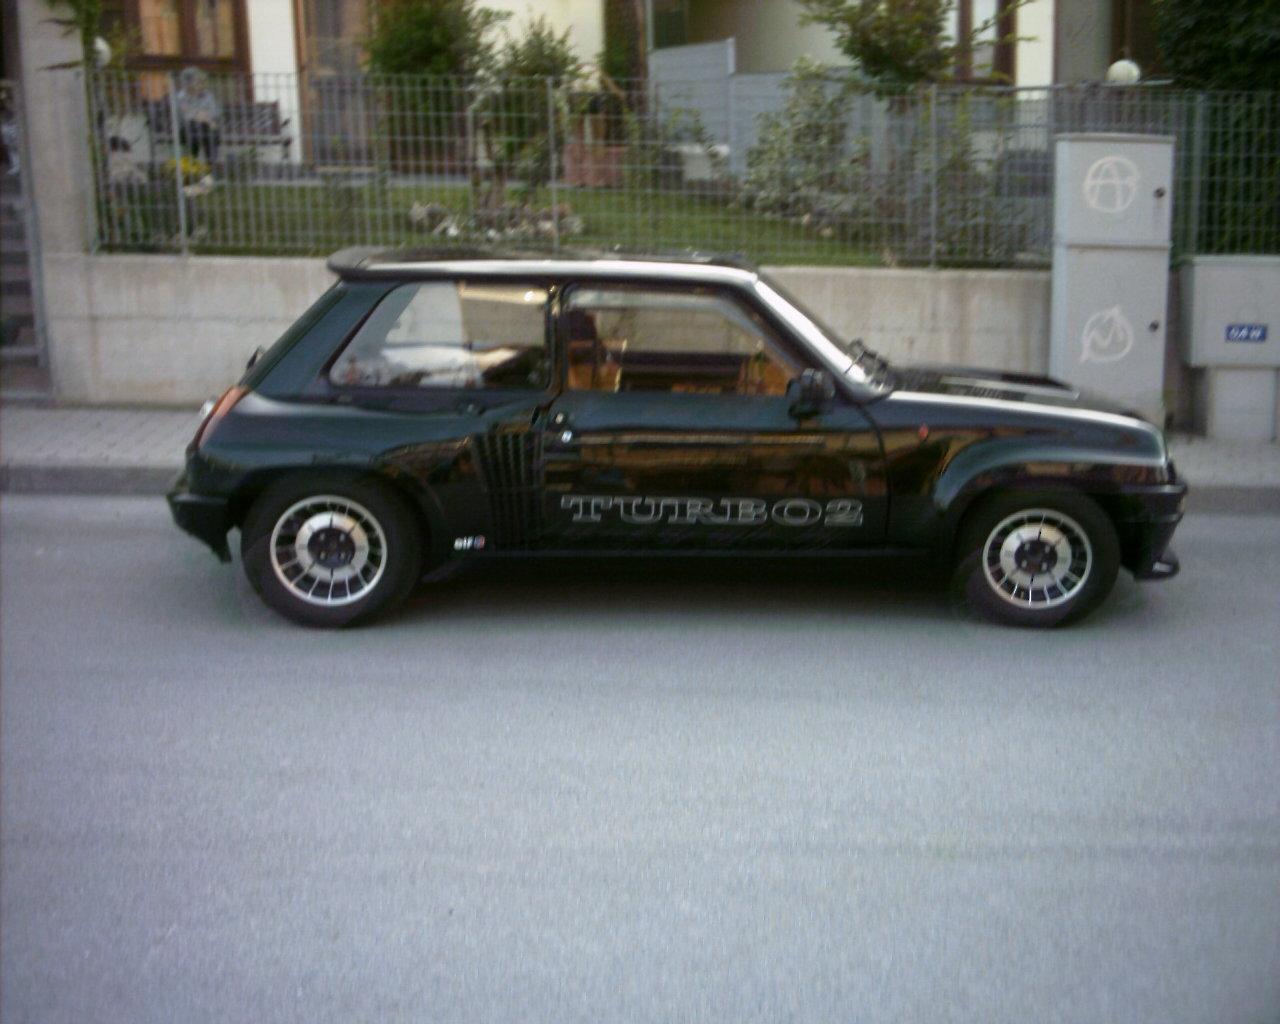 renault 5 maxi turbo rally car. Black Bedroom Furniture Sets. Home Design Ideas